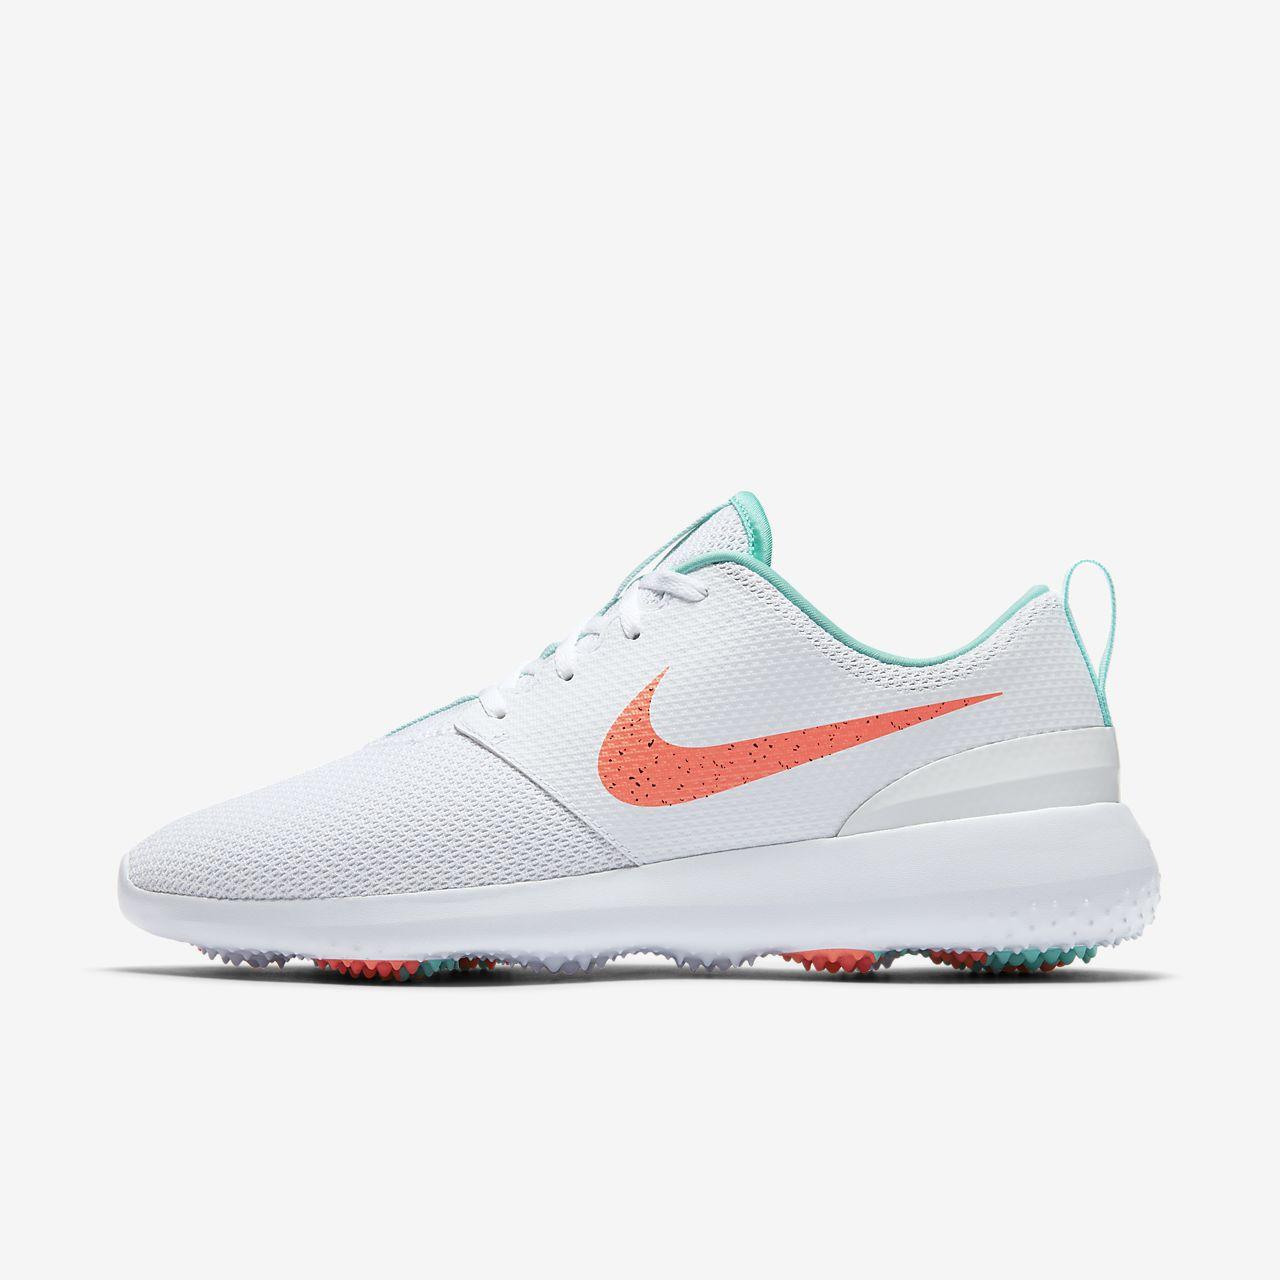 premium selection 42506 f50ec Nike Roshe G Men's Golf Shoe. Nike.com ZA